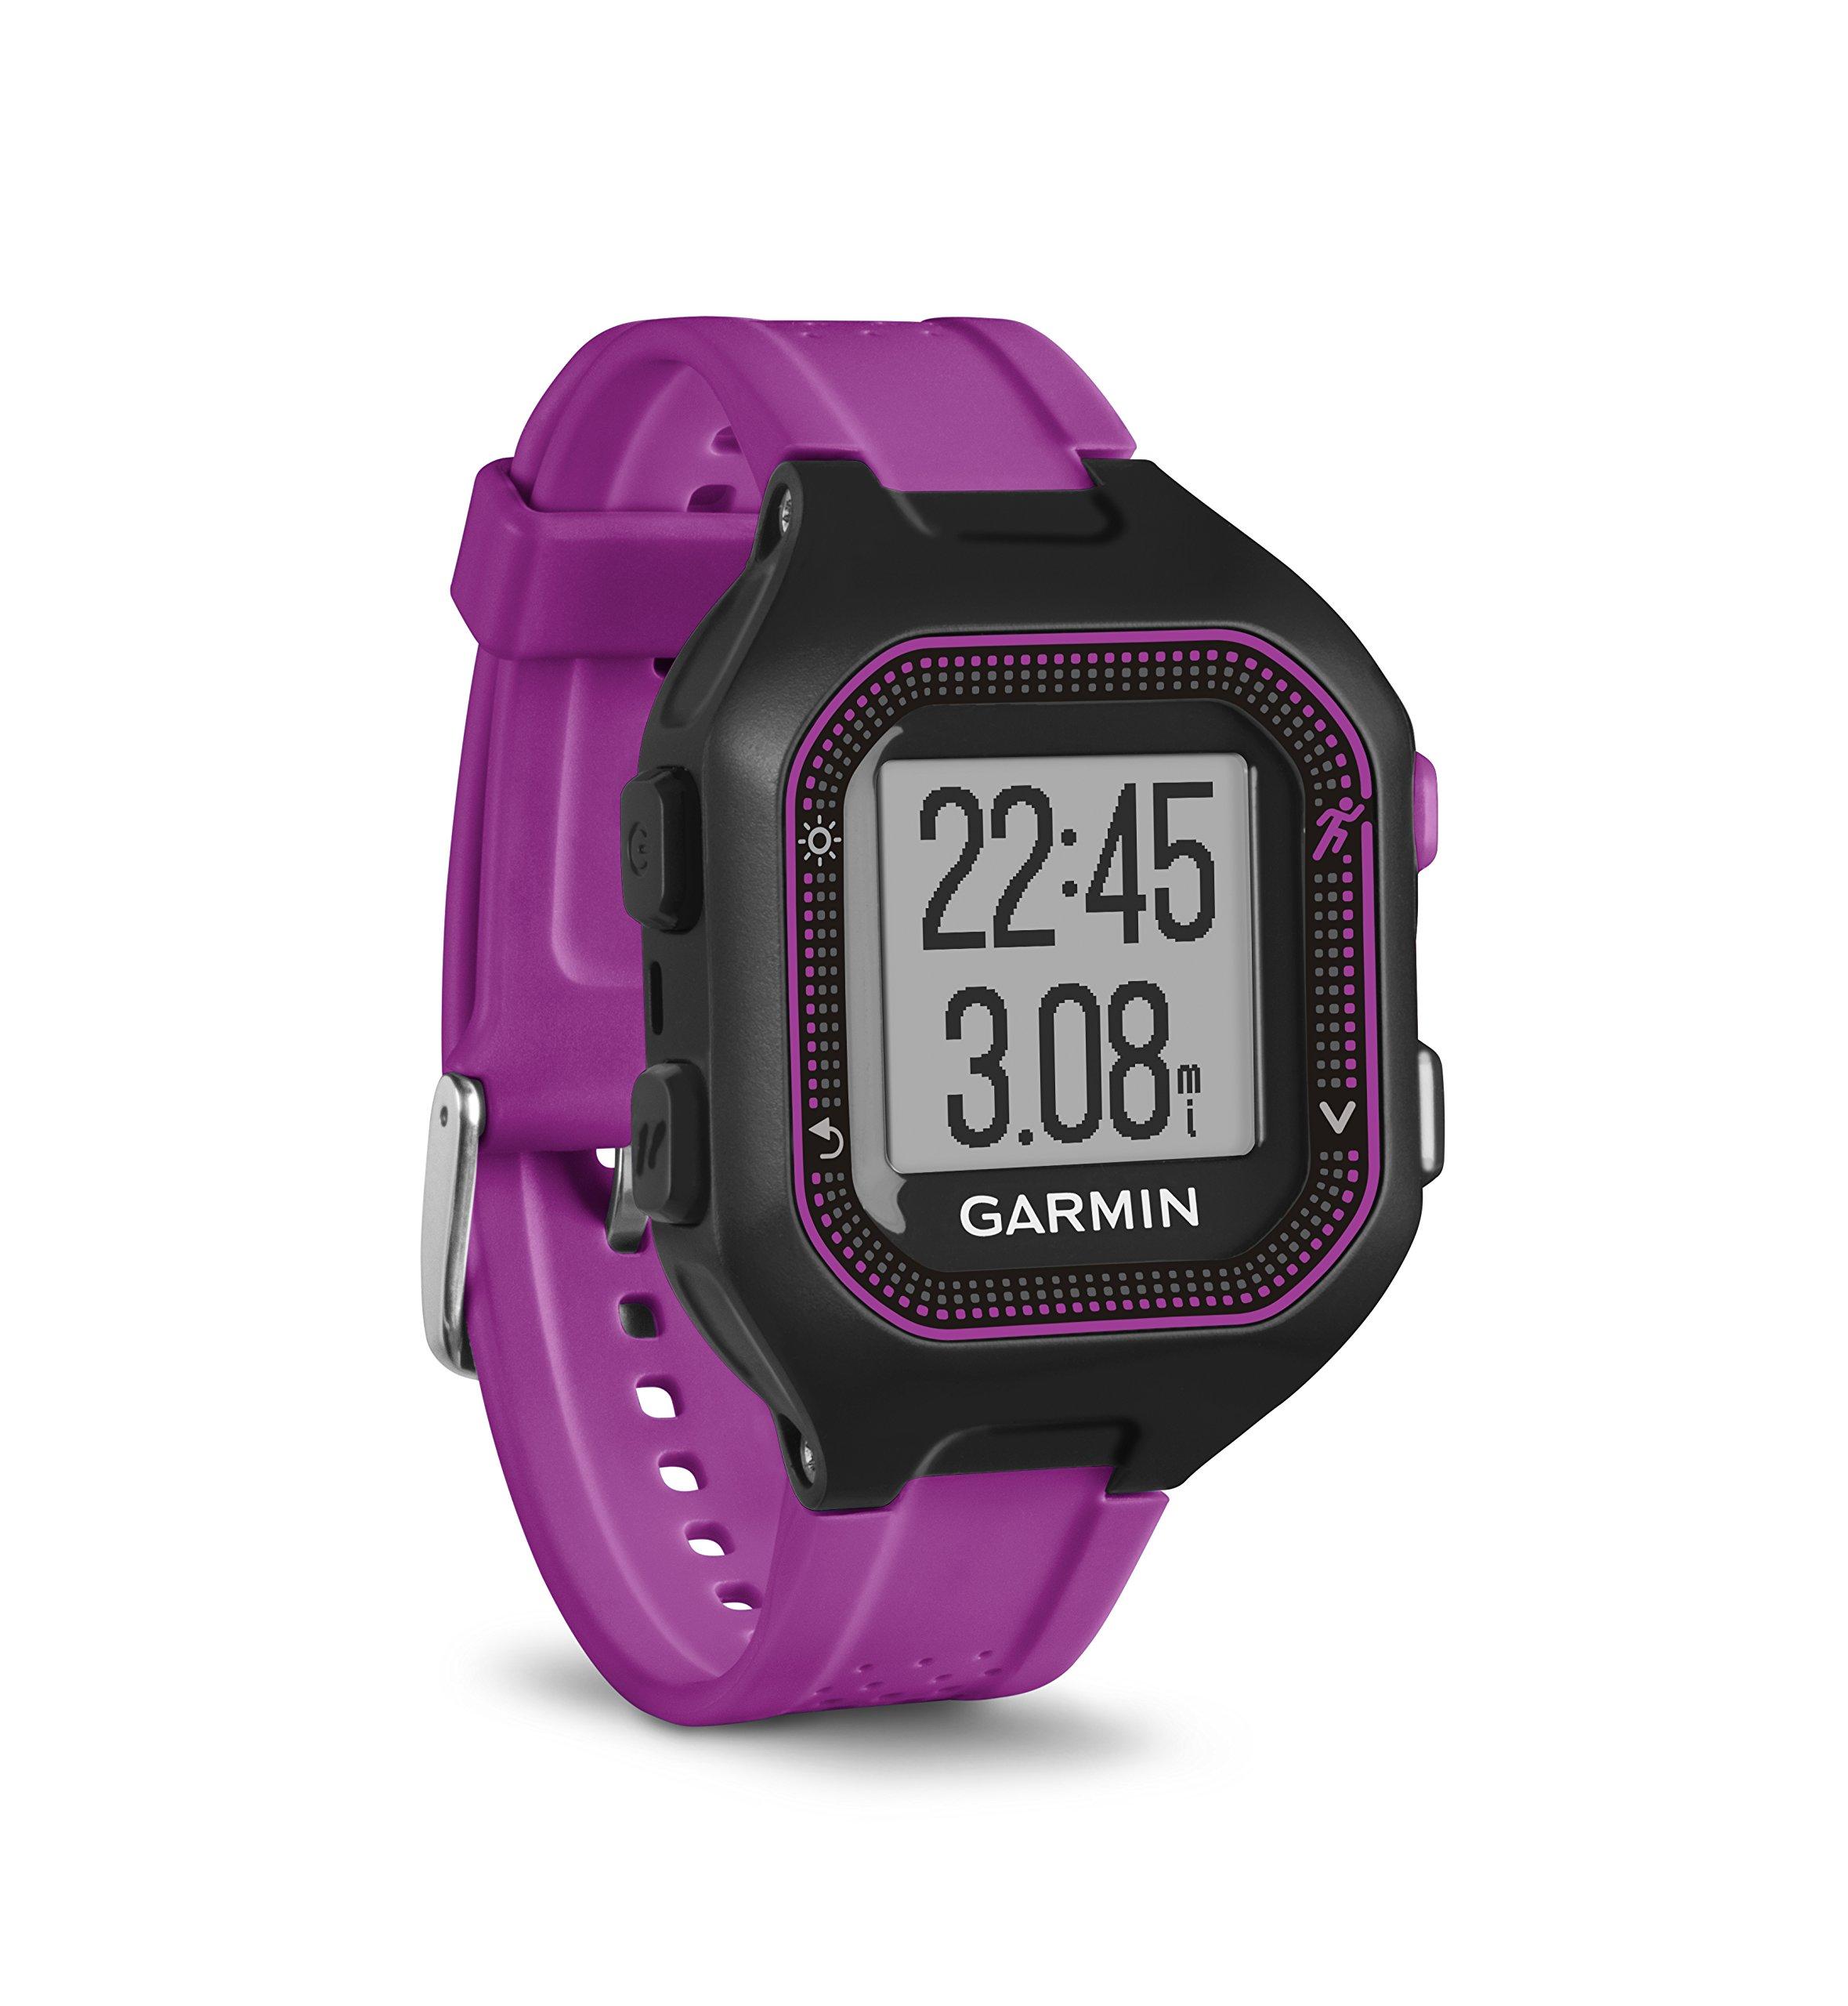 Garmin Forerunner 25, Small - Black and Purple by Garmin